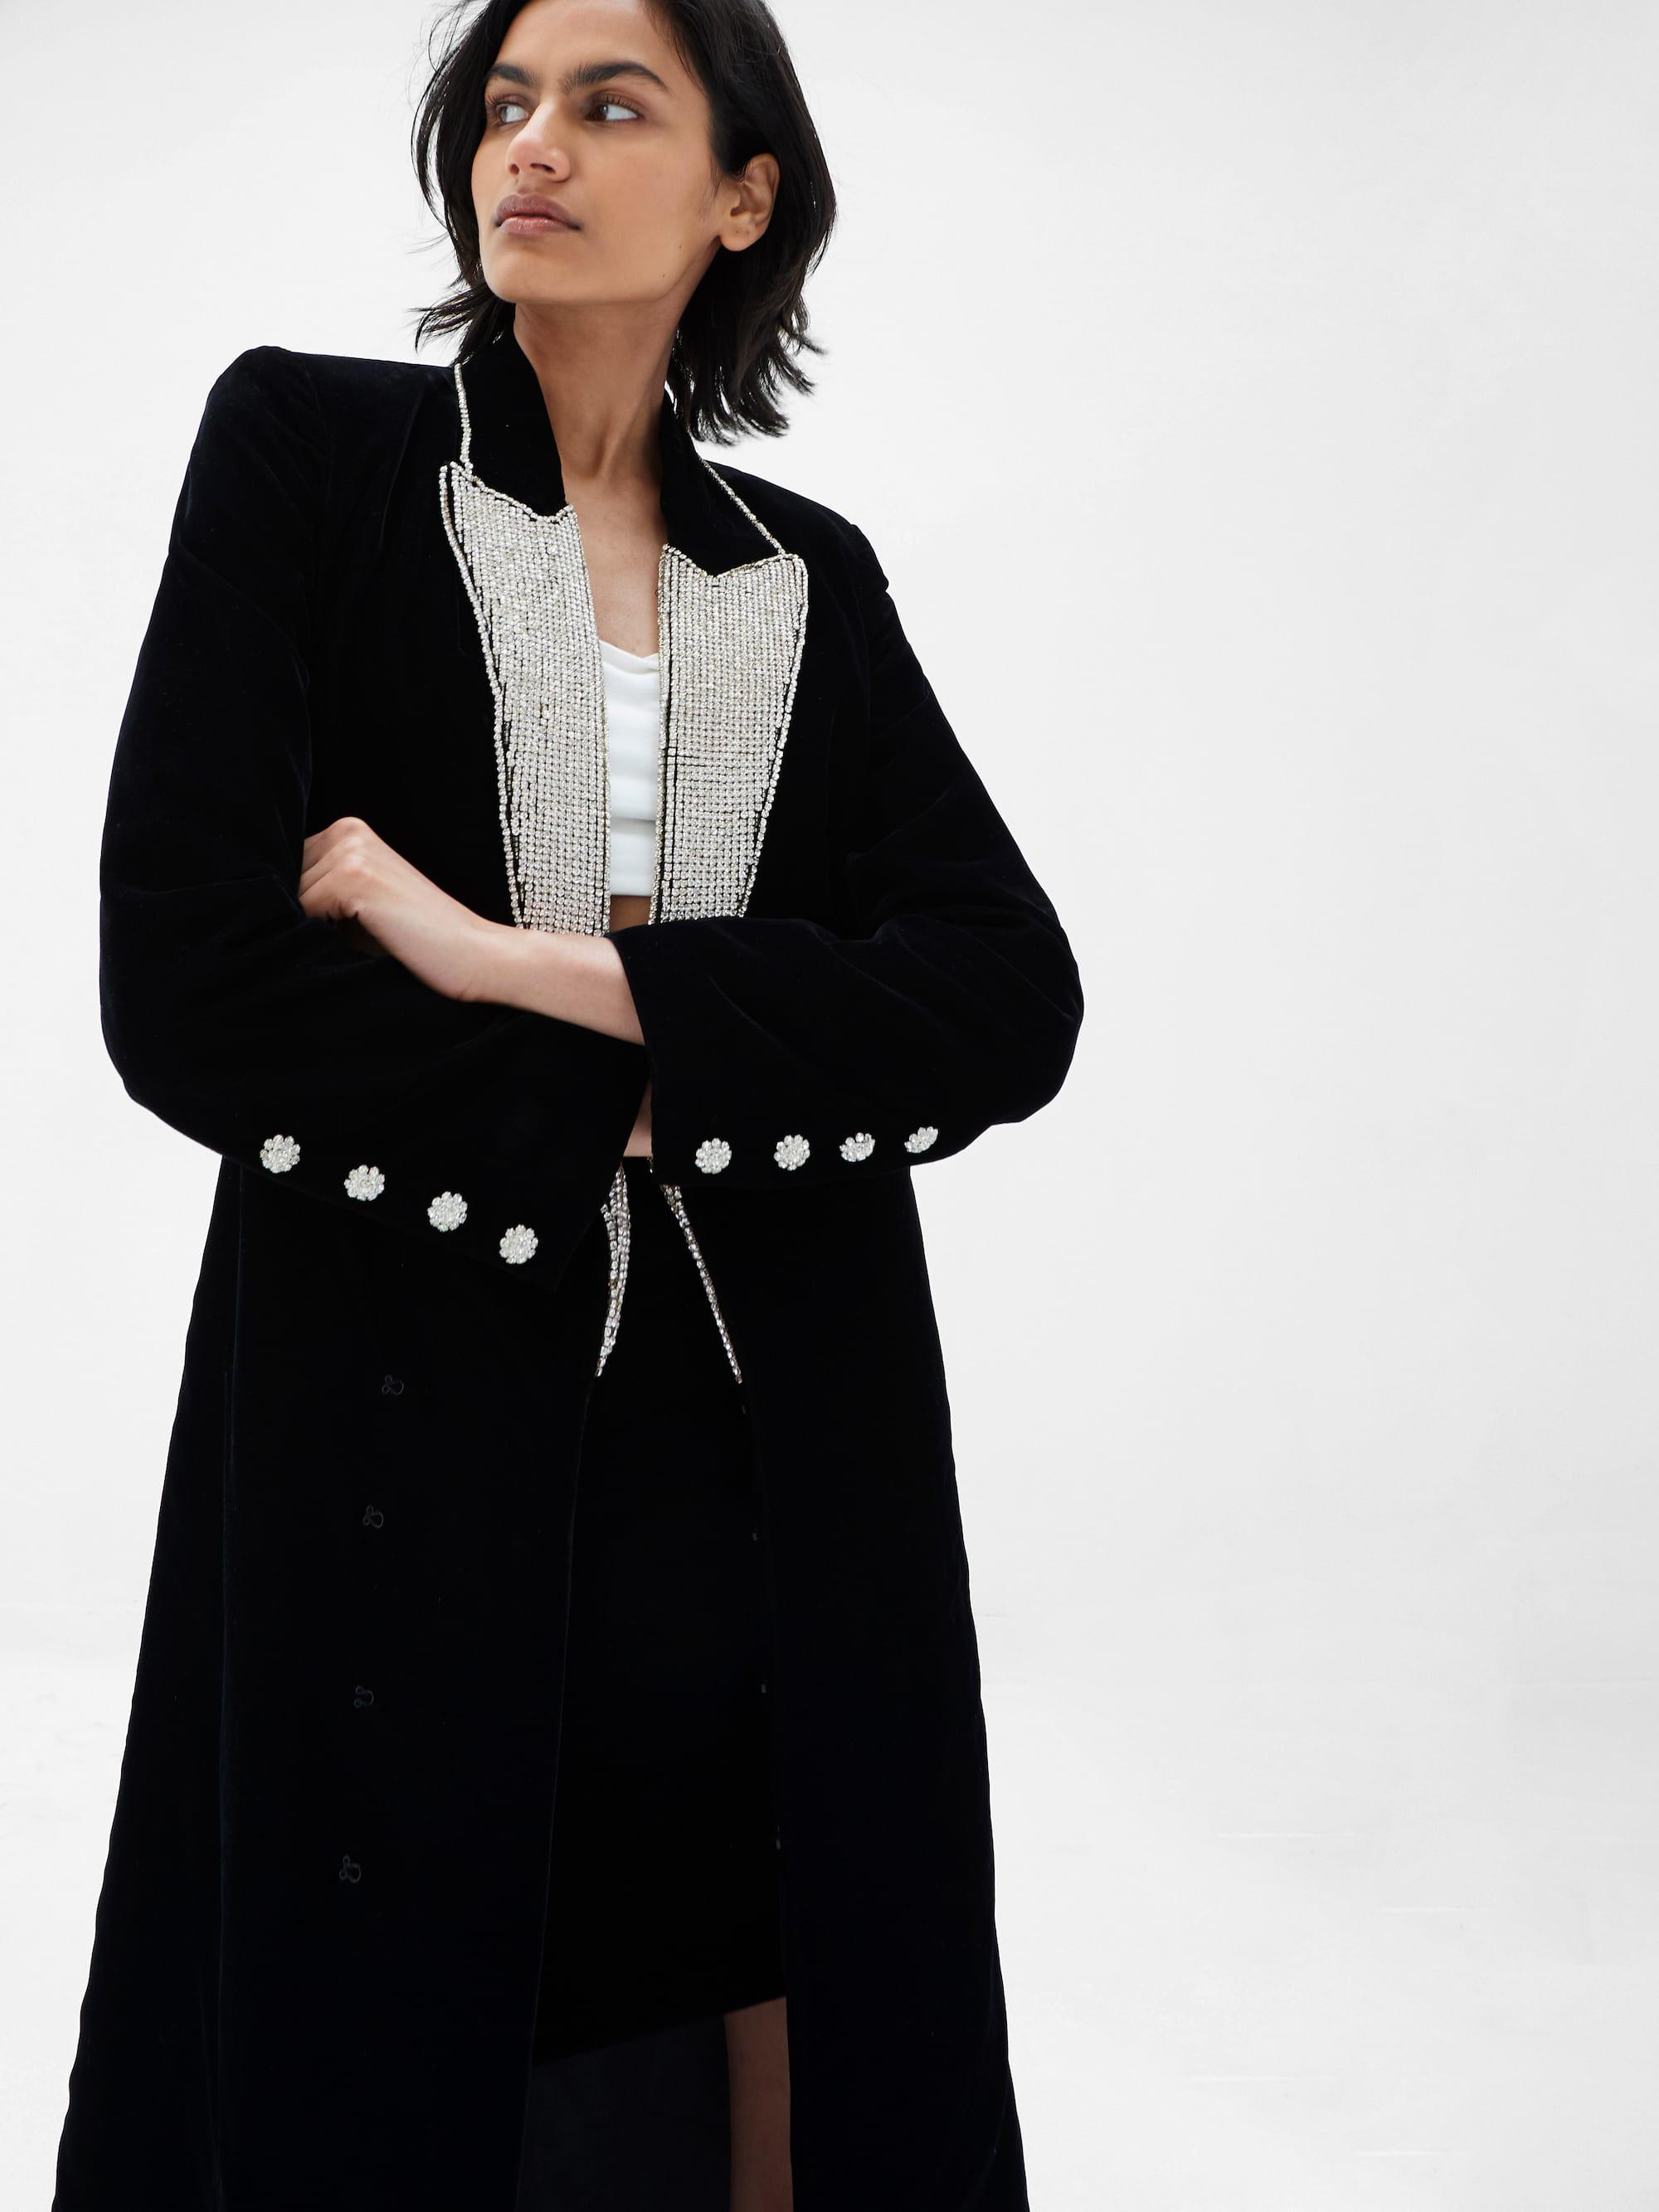 View 3 of model wearing Kalia Kimono in black.